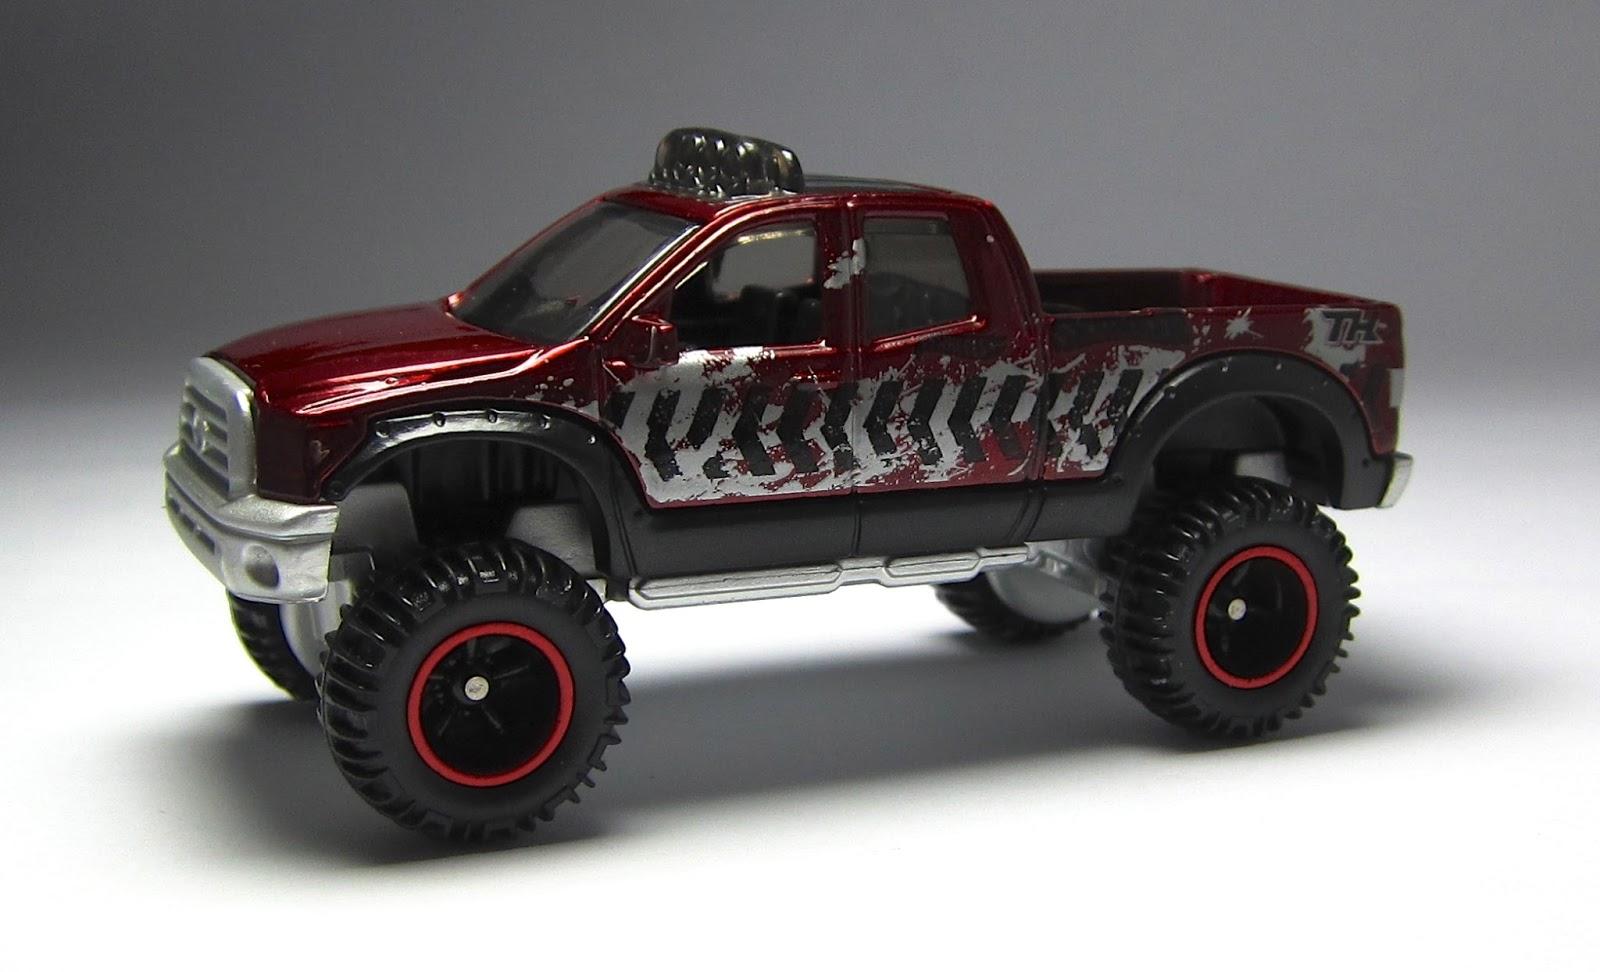 Group: First Look: Hot Wheels Toyota Tundra Super Treasure Hunt